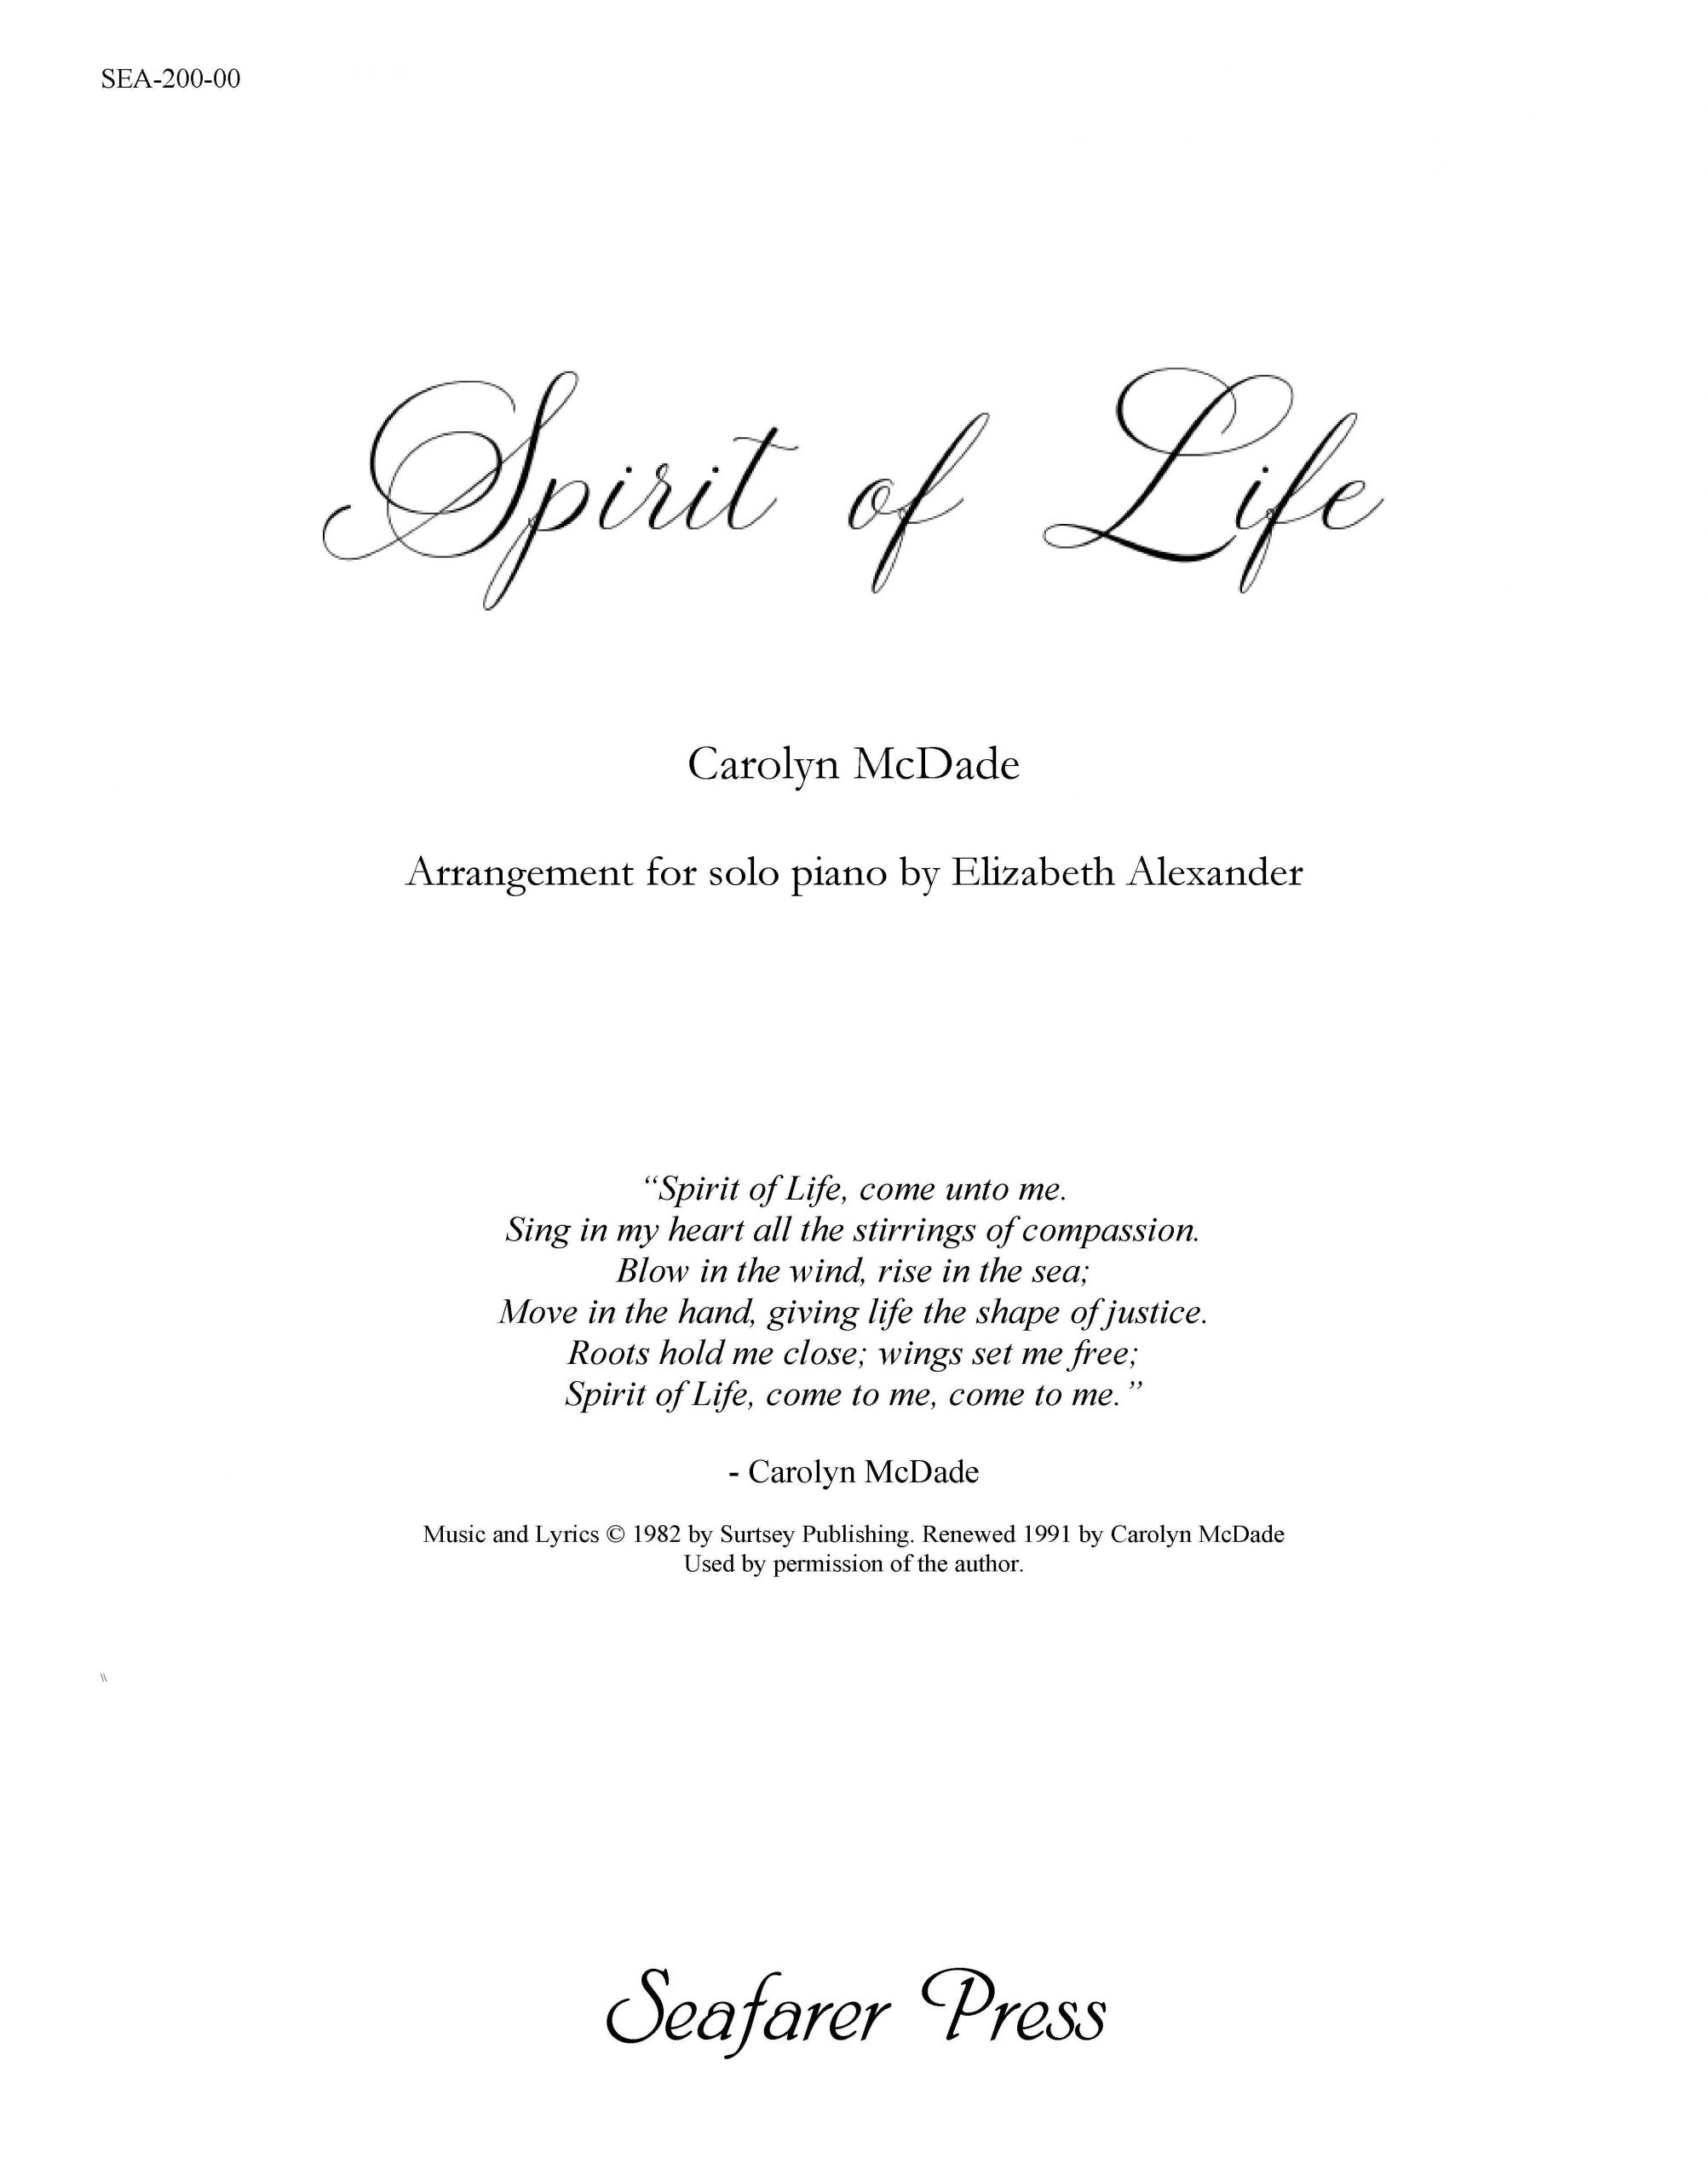 SEA-200-00 - Spirit of Life (arr.)